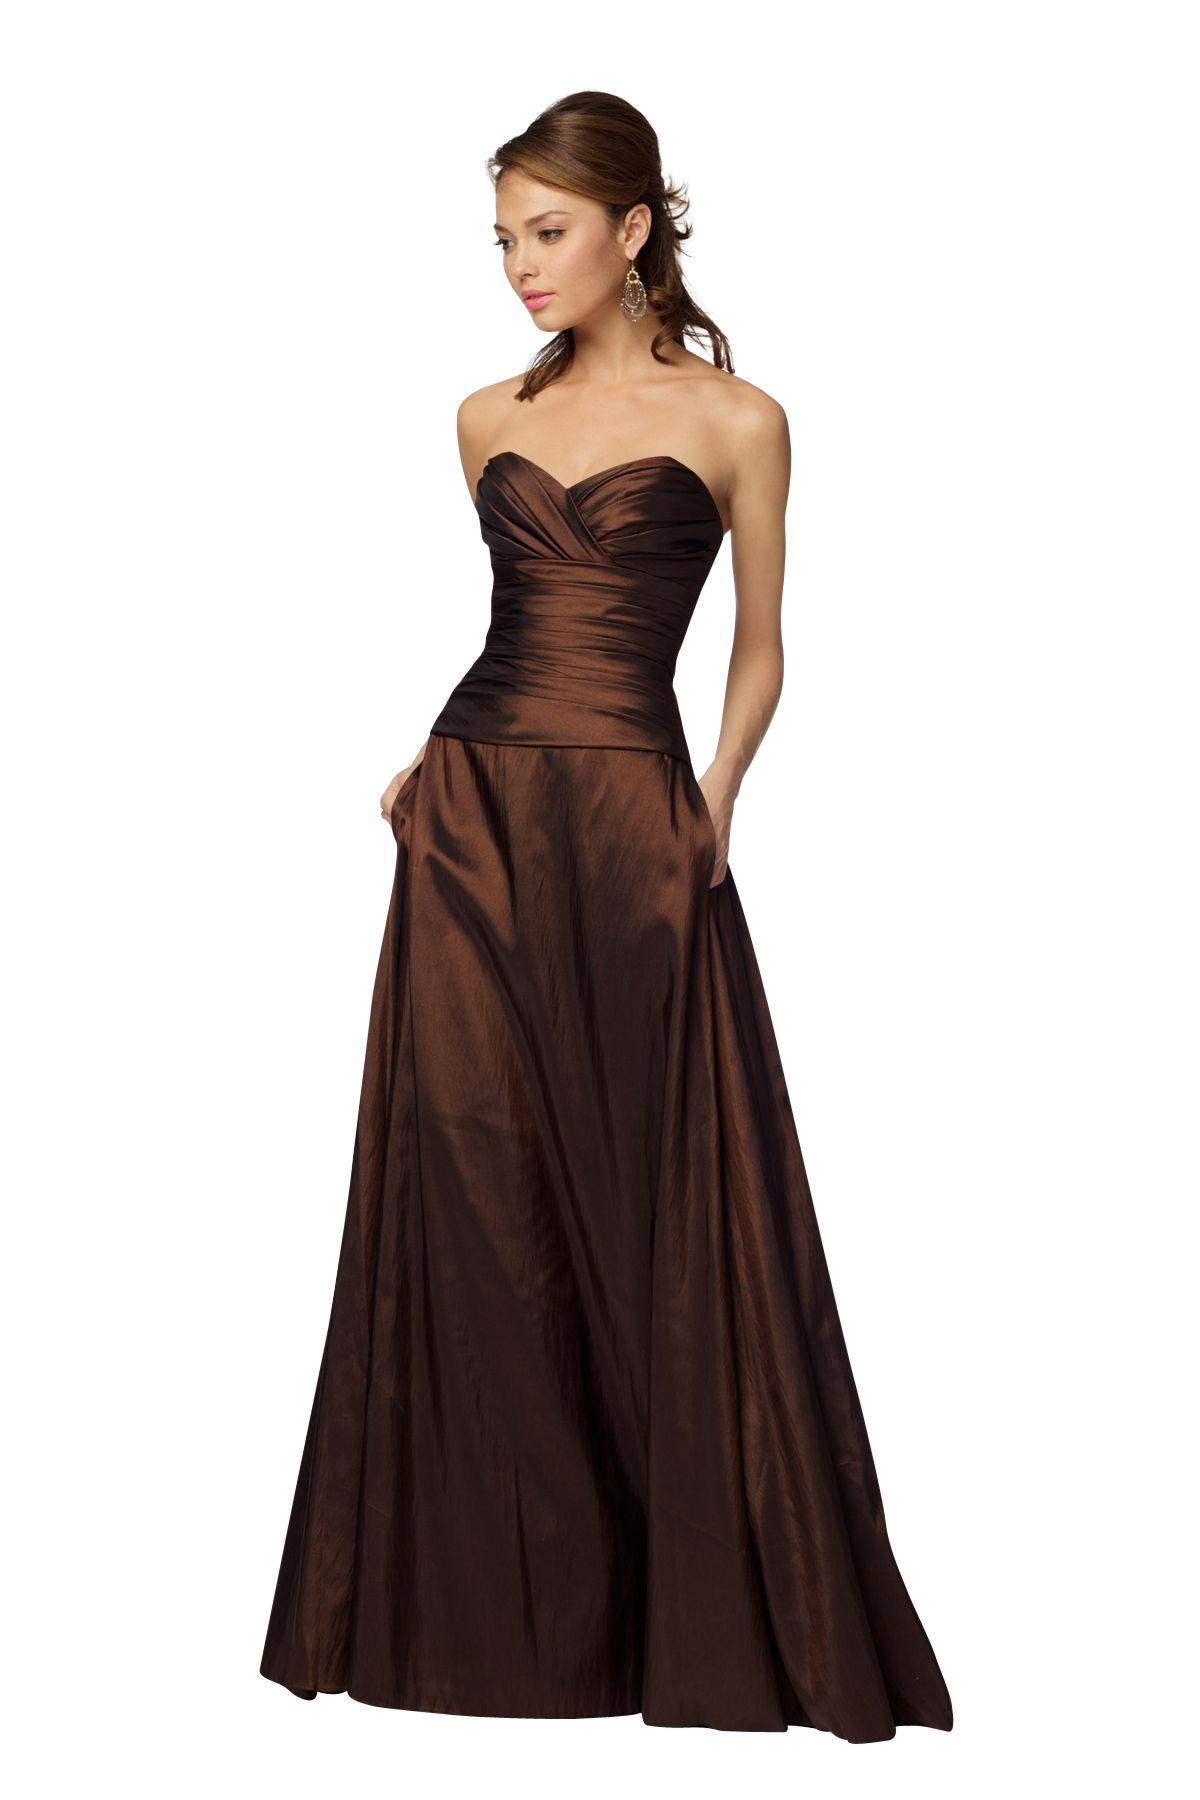 Copper bridesmaid dress google search wedding ideas copper bridesmaid dress google search ombrellifo Choice Image